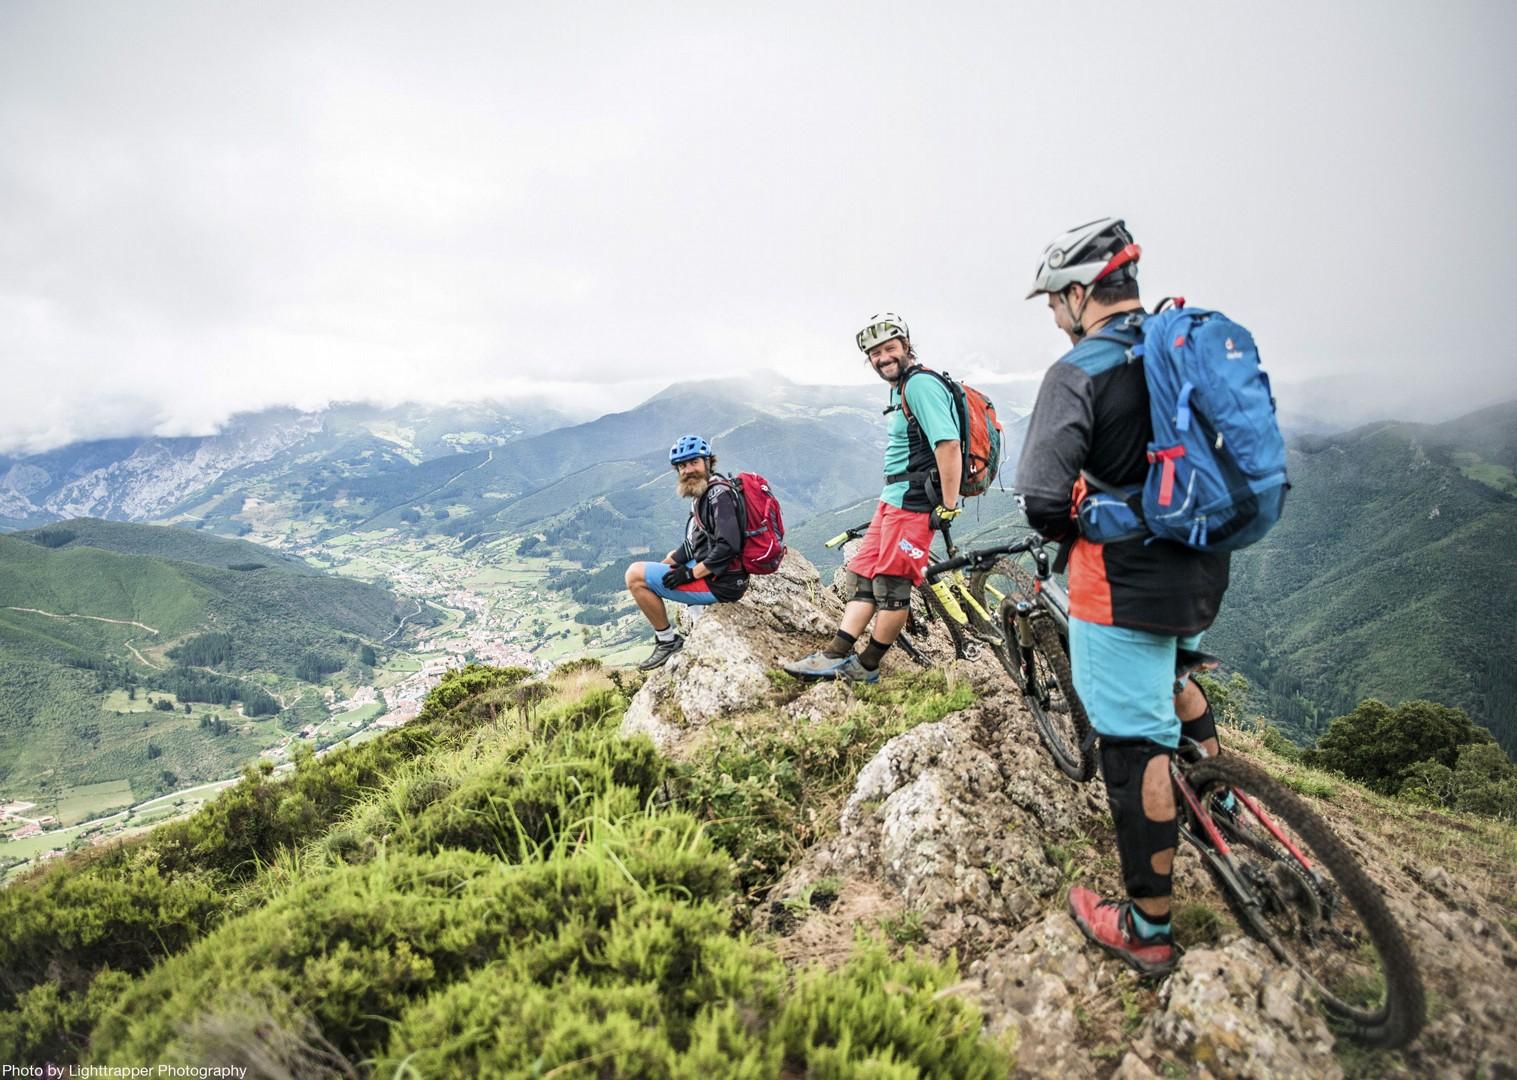 mountain-biking-trip-northern-spain-picos-de-europa-national-park.jpg - Spain - Picos de Europa - Trans Picos - Guided Mountain Bike Holiday - Mountain Biking